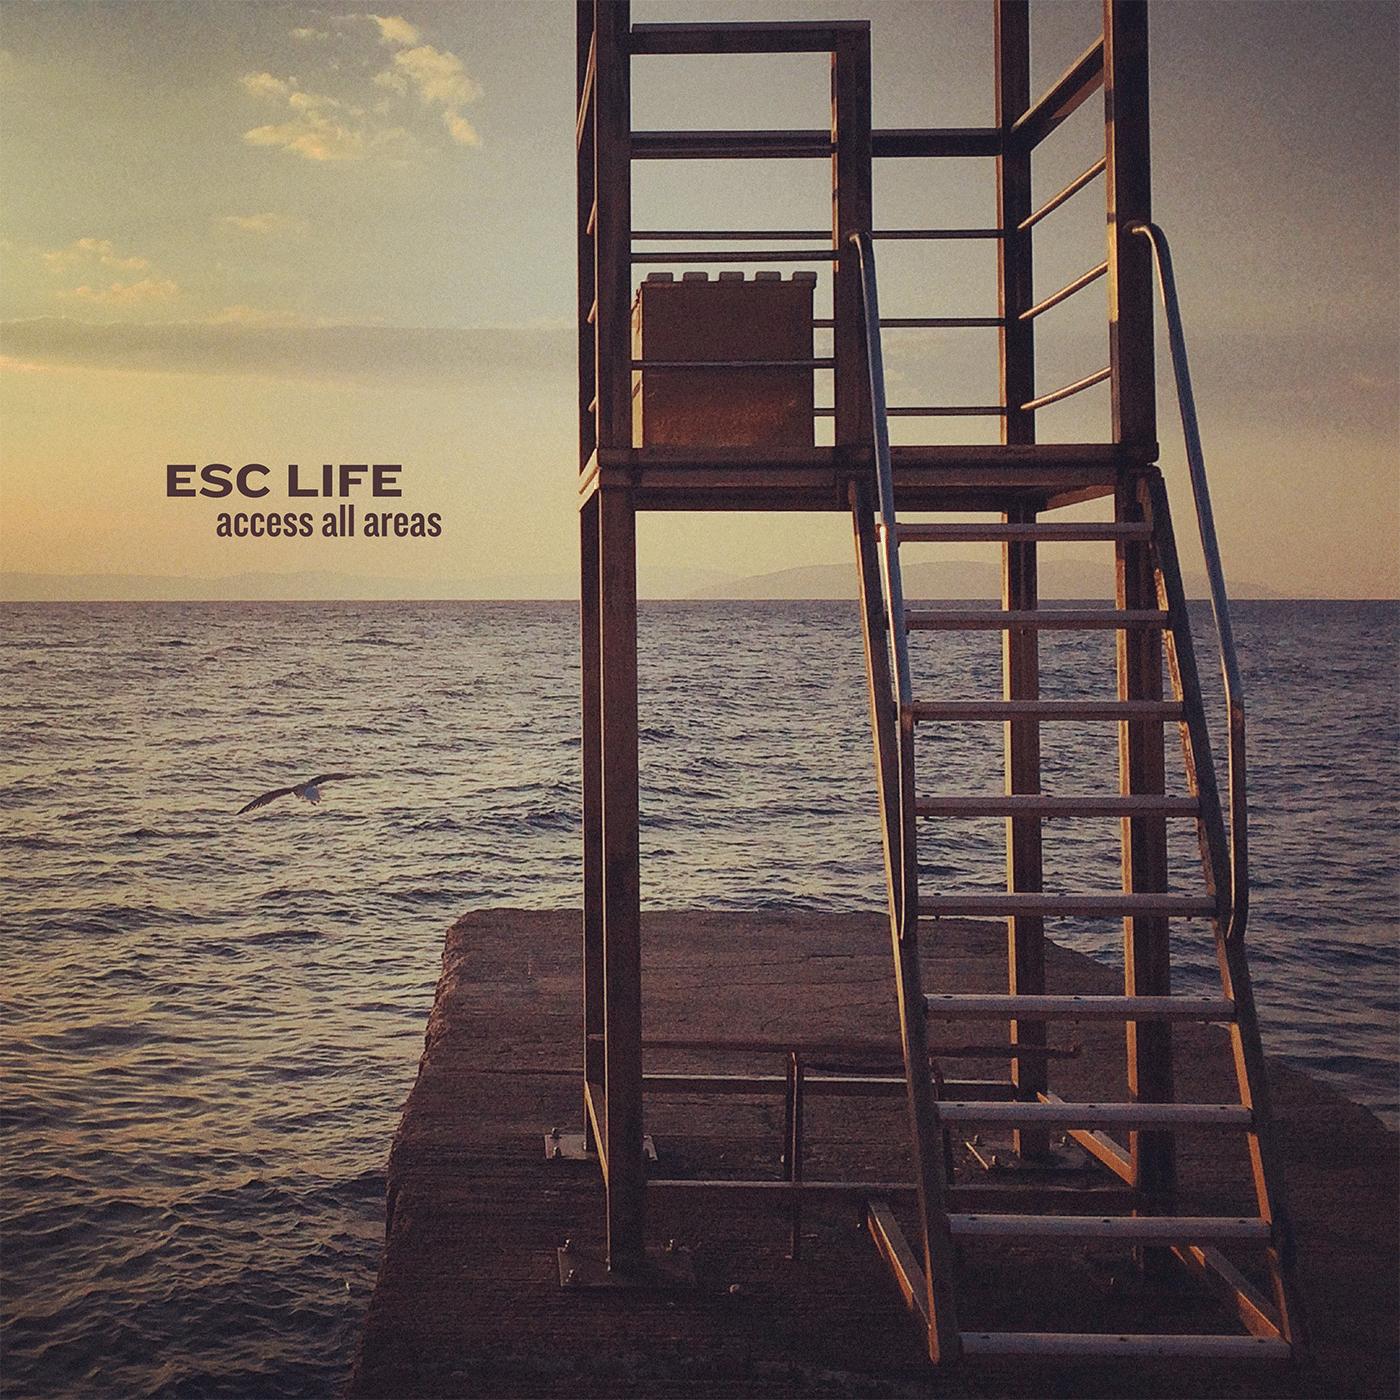 esc-life-access-all-areas-cover